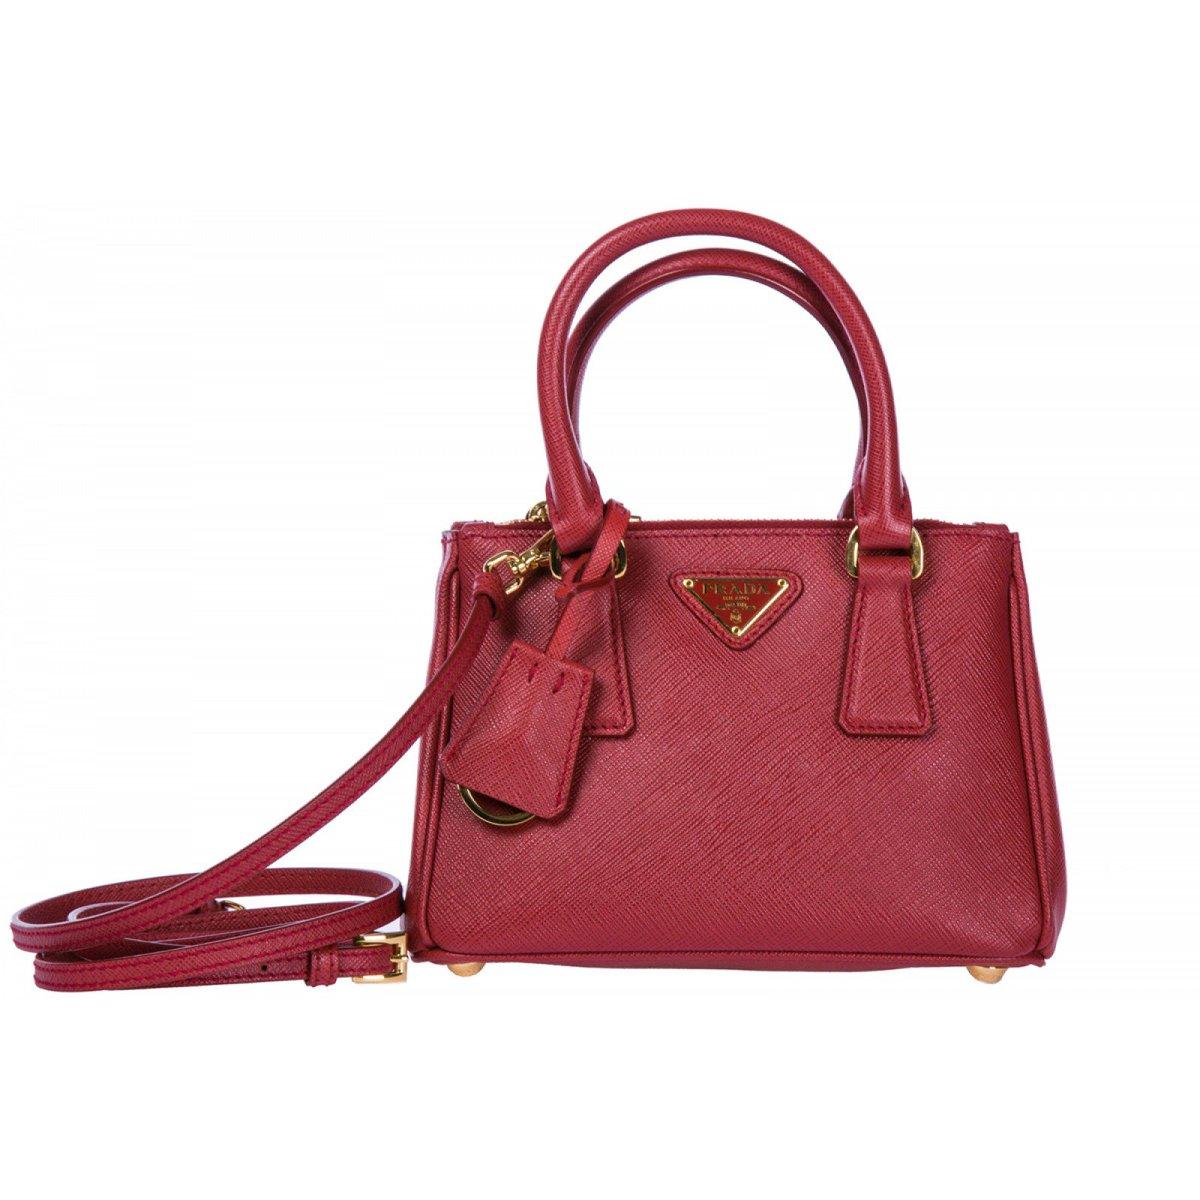 56c52e696117 ... coupon code for frmoda on twitter prada womens leather cross body  messenger shoulder bag extra sale